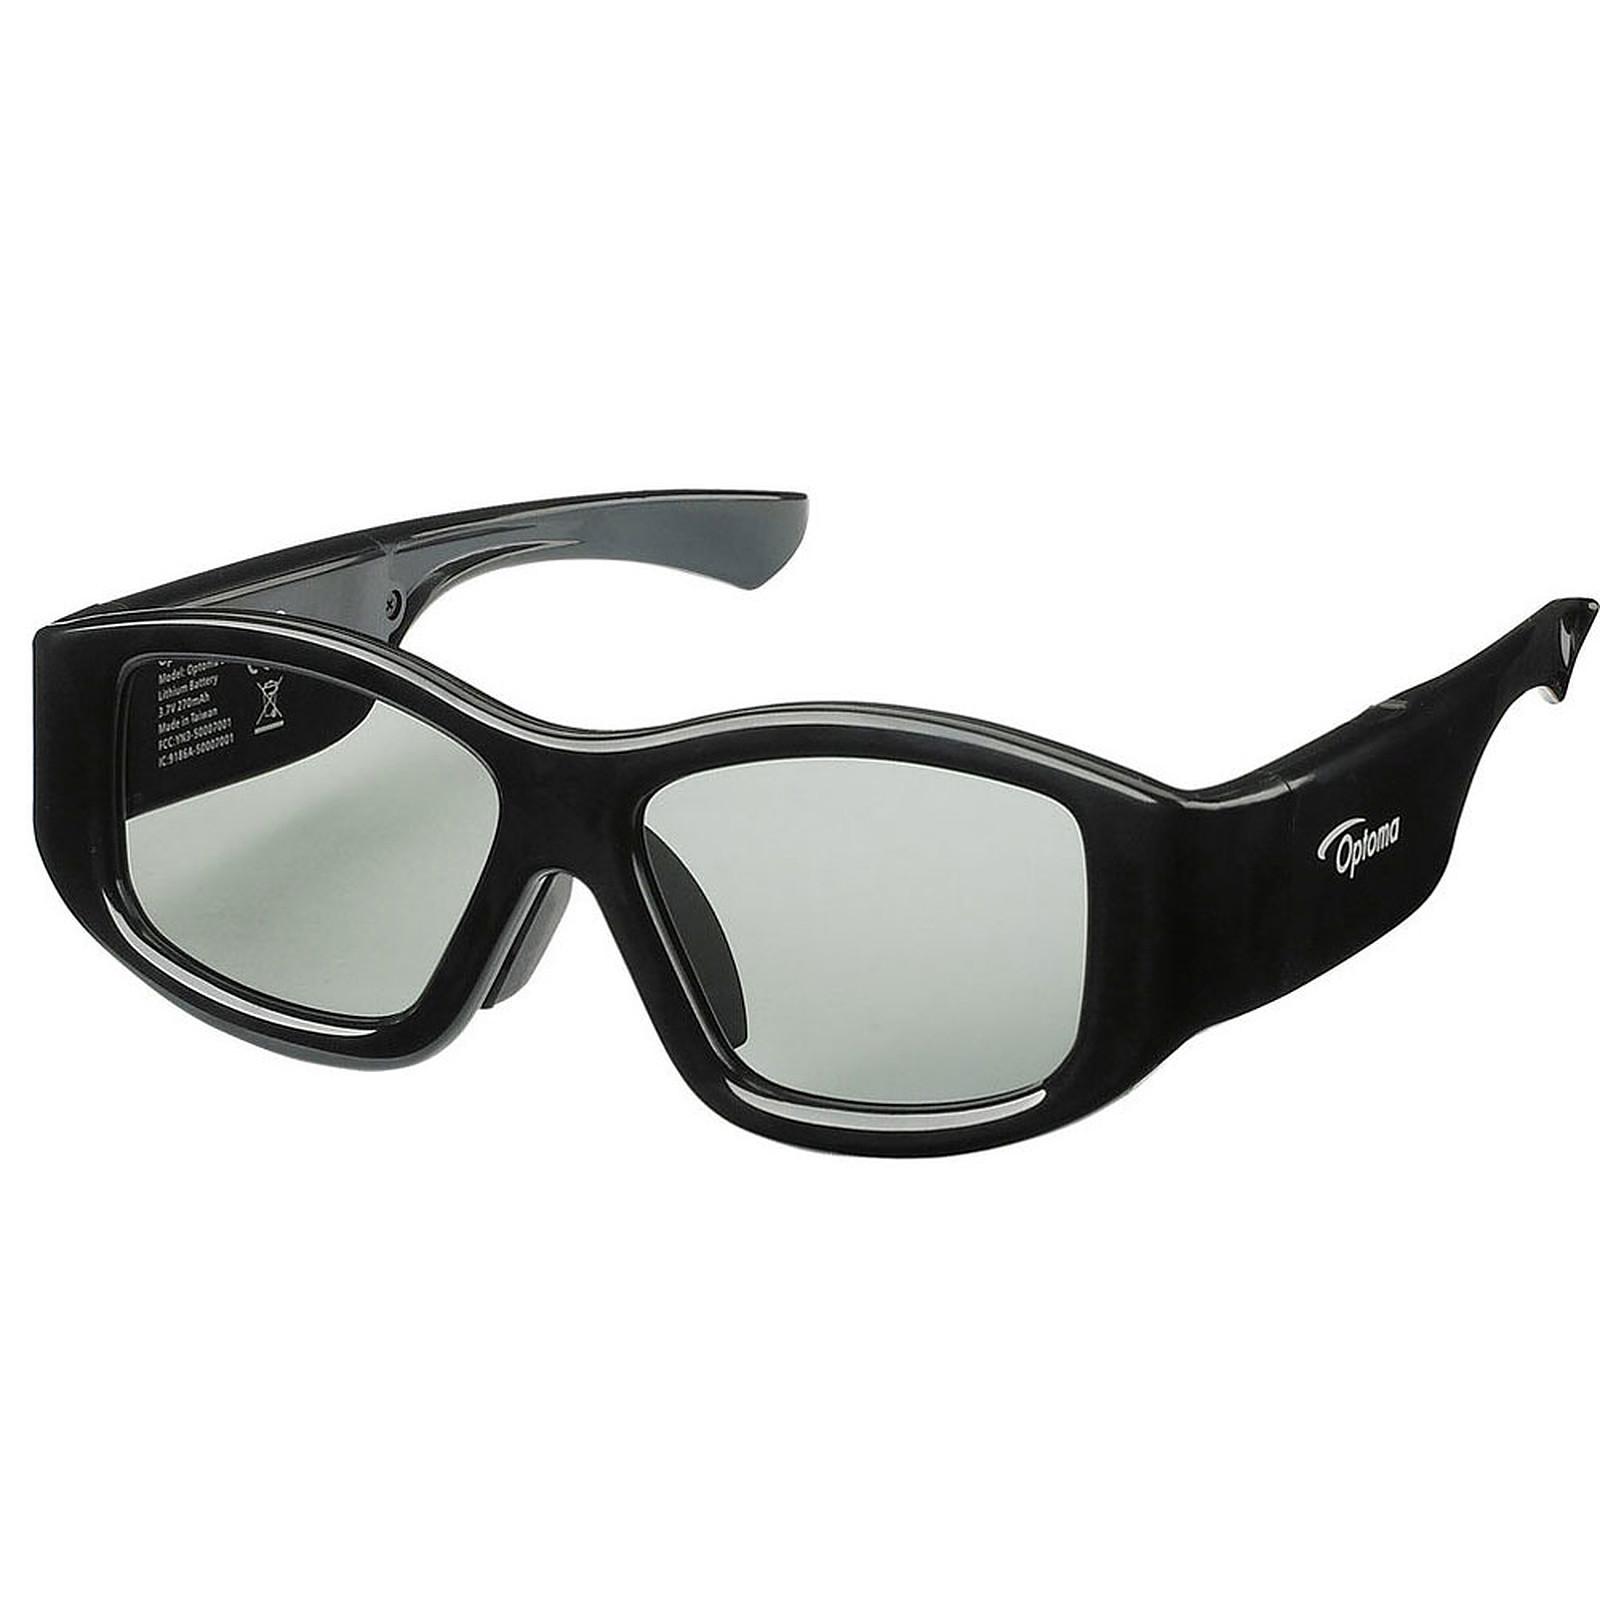 Optoma 3D-RF